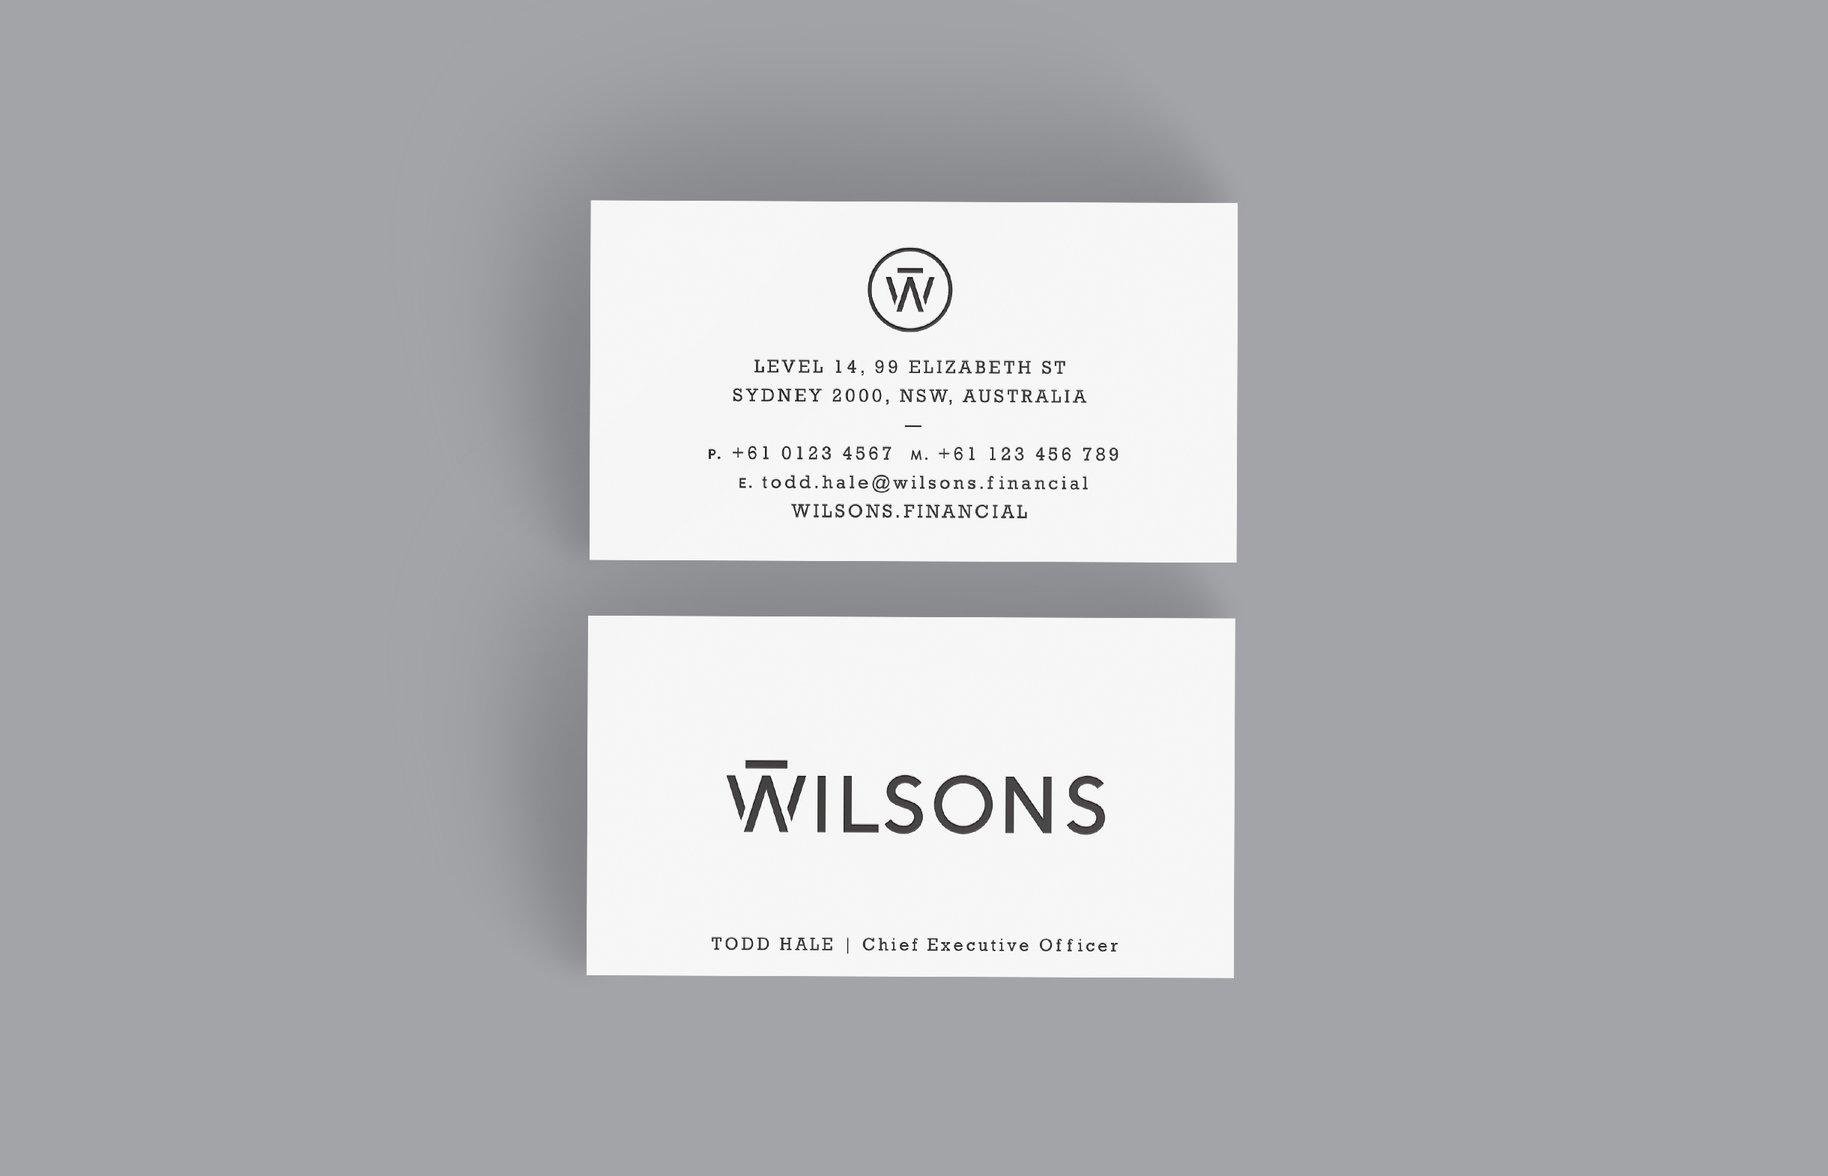 Wilsons investment advisors case study